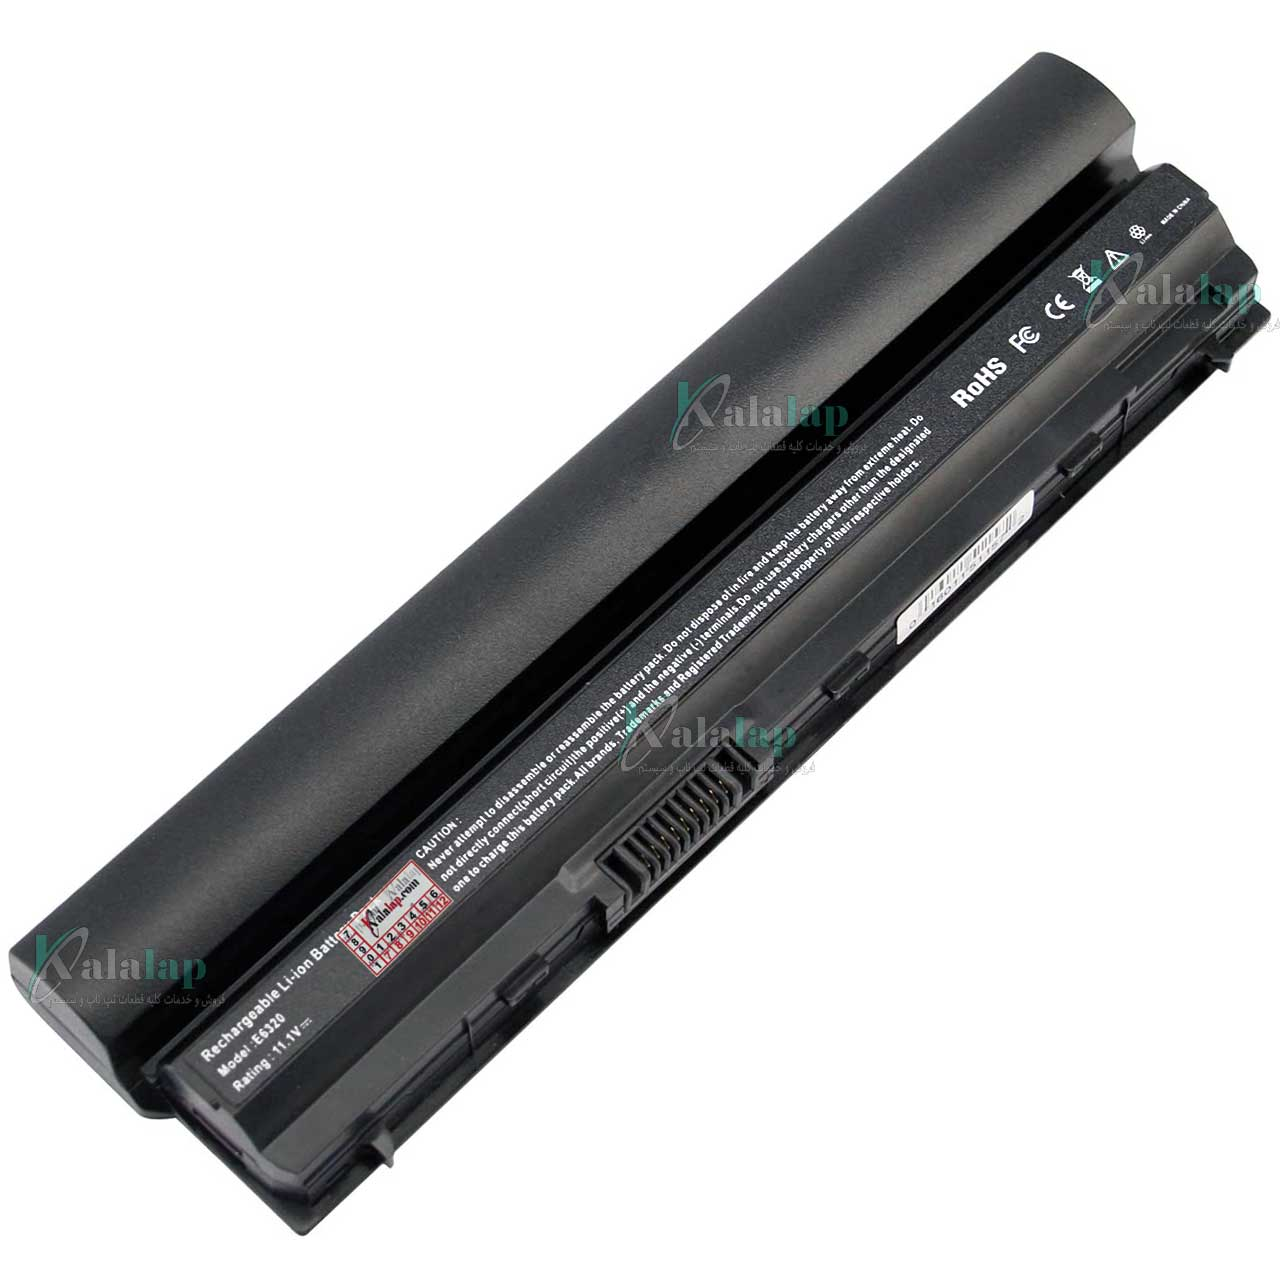 باتری لپ تاپ دل Battery Laptop Dell Latitude E6230